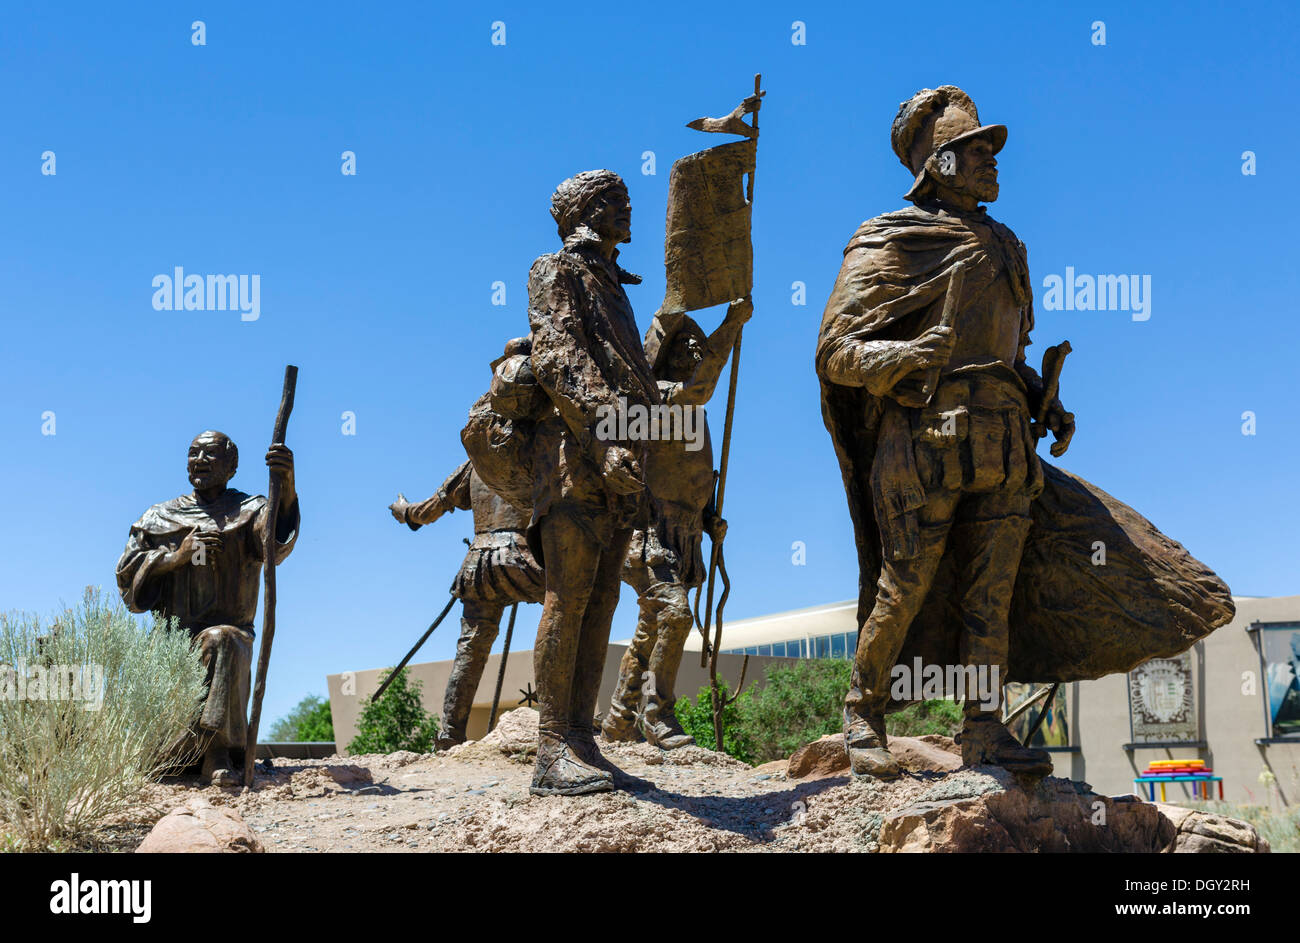 Sculptures outside the Albuquerque Museum of Art and History, Albuquerque, New Mexico, USA Stock Photo